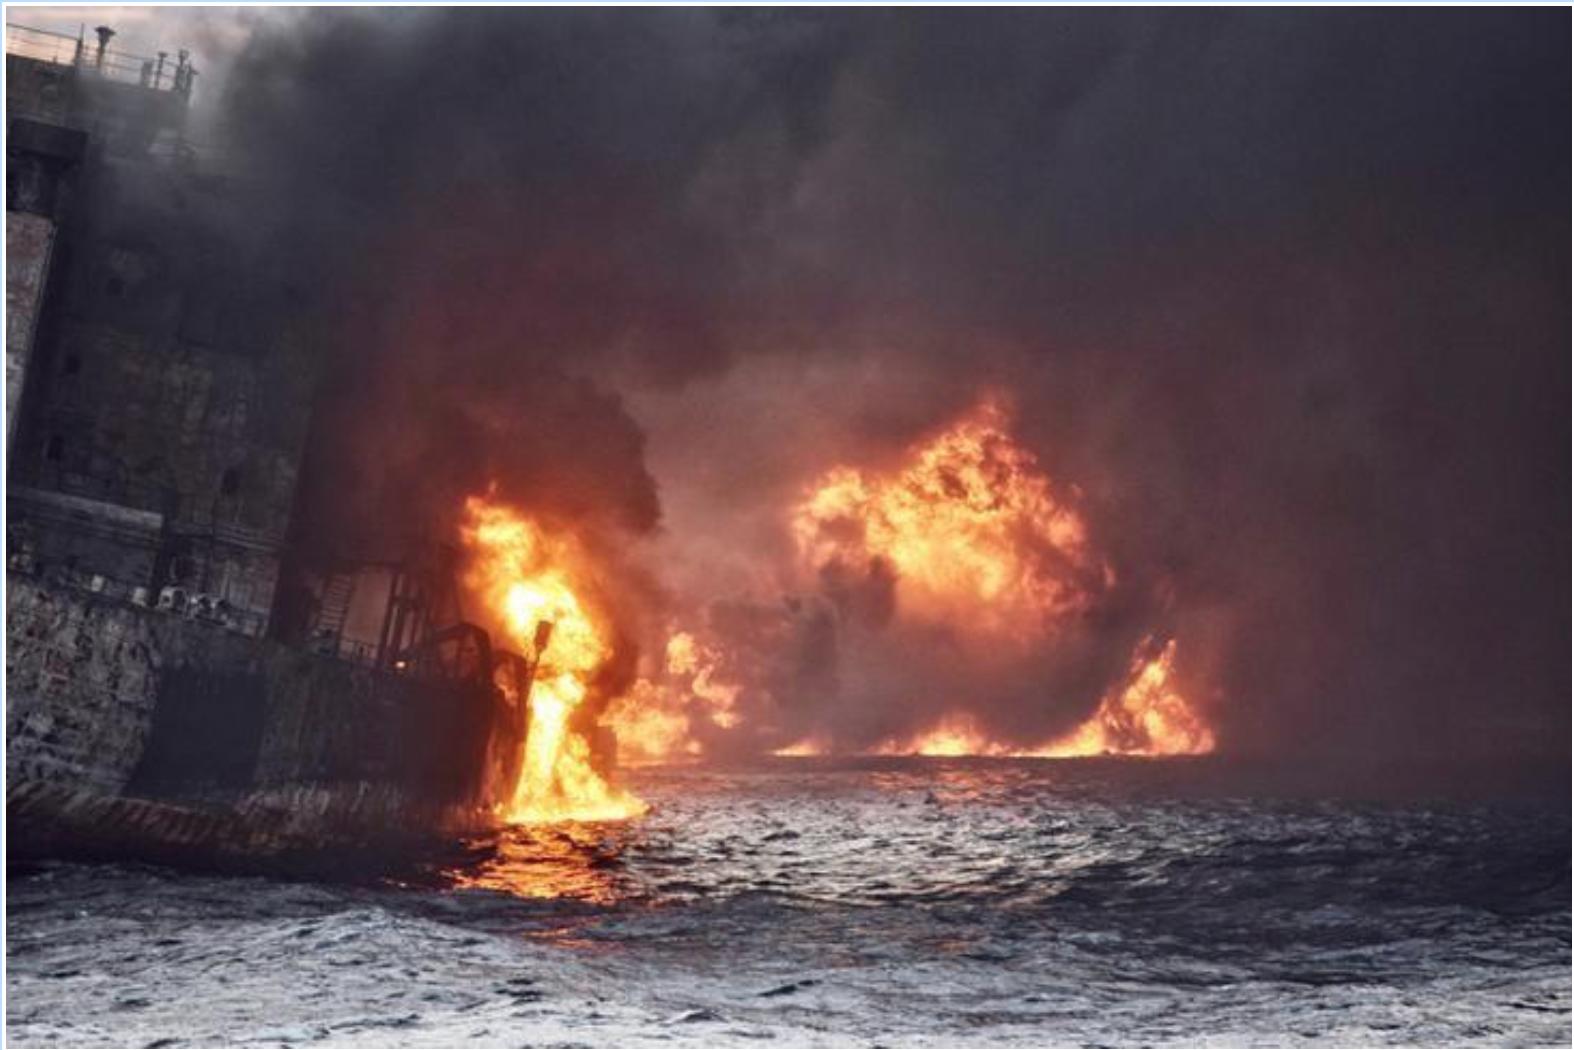 Tanquero iraní en llamas se hunde tras accidente: TV estatal china